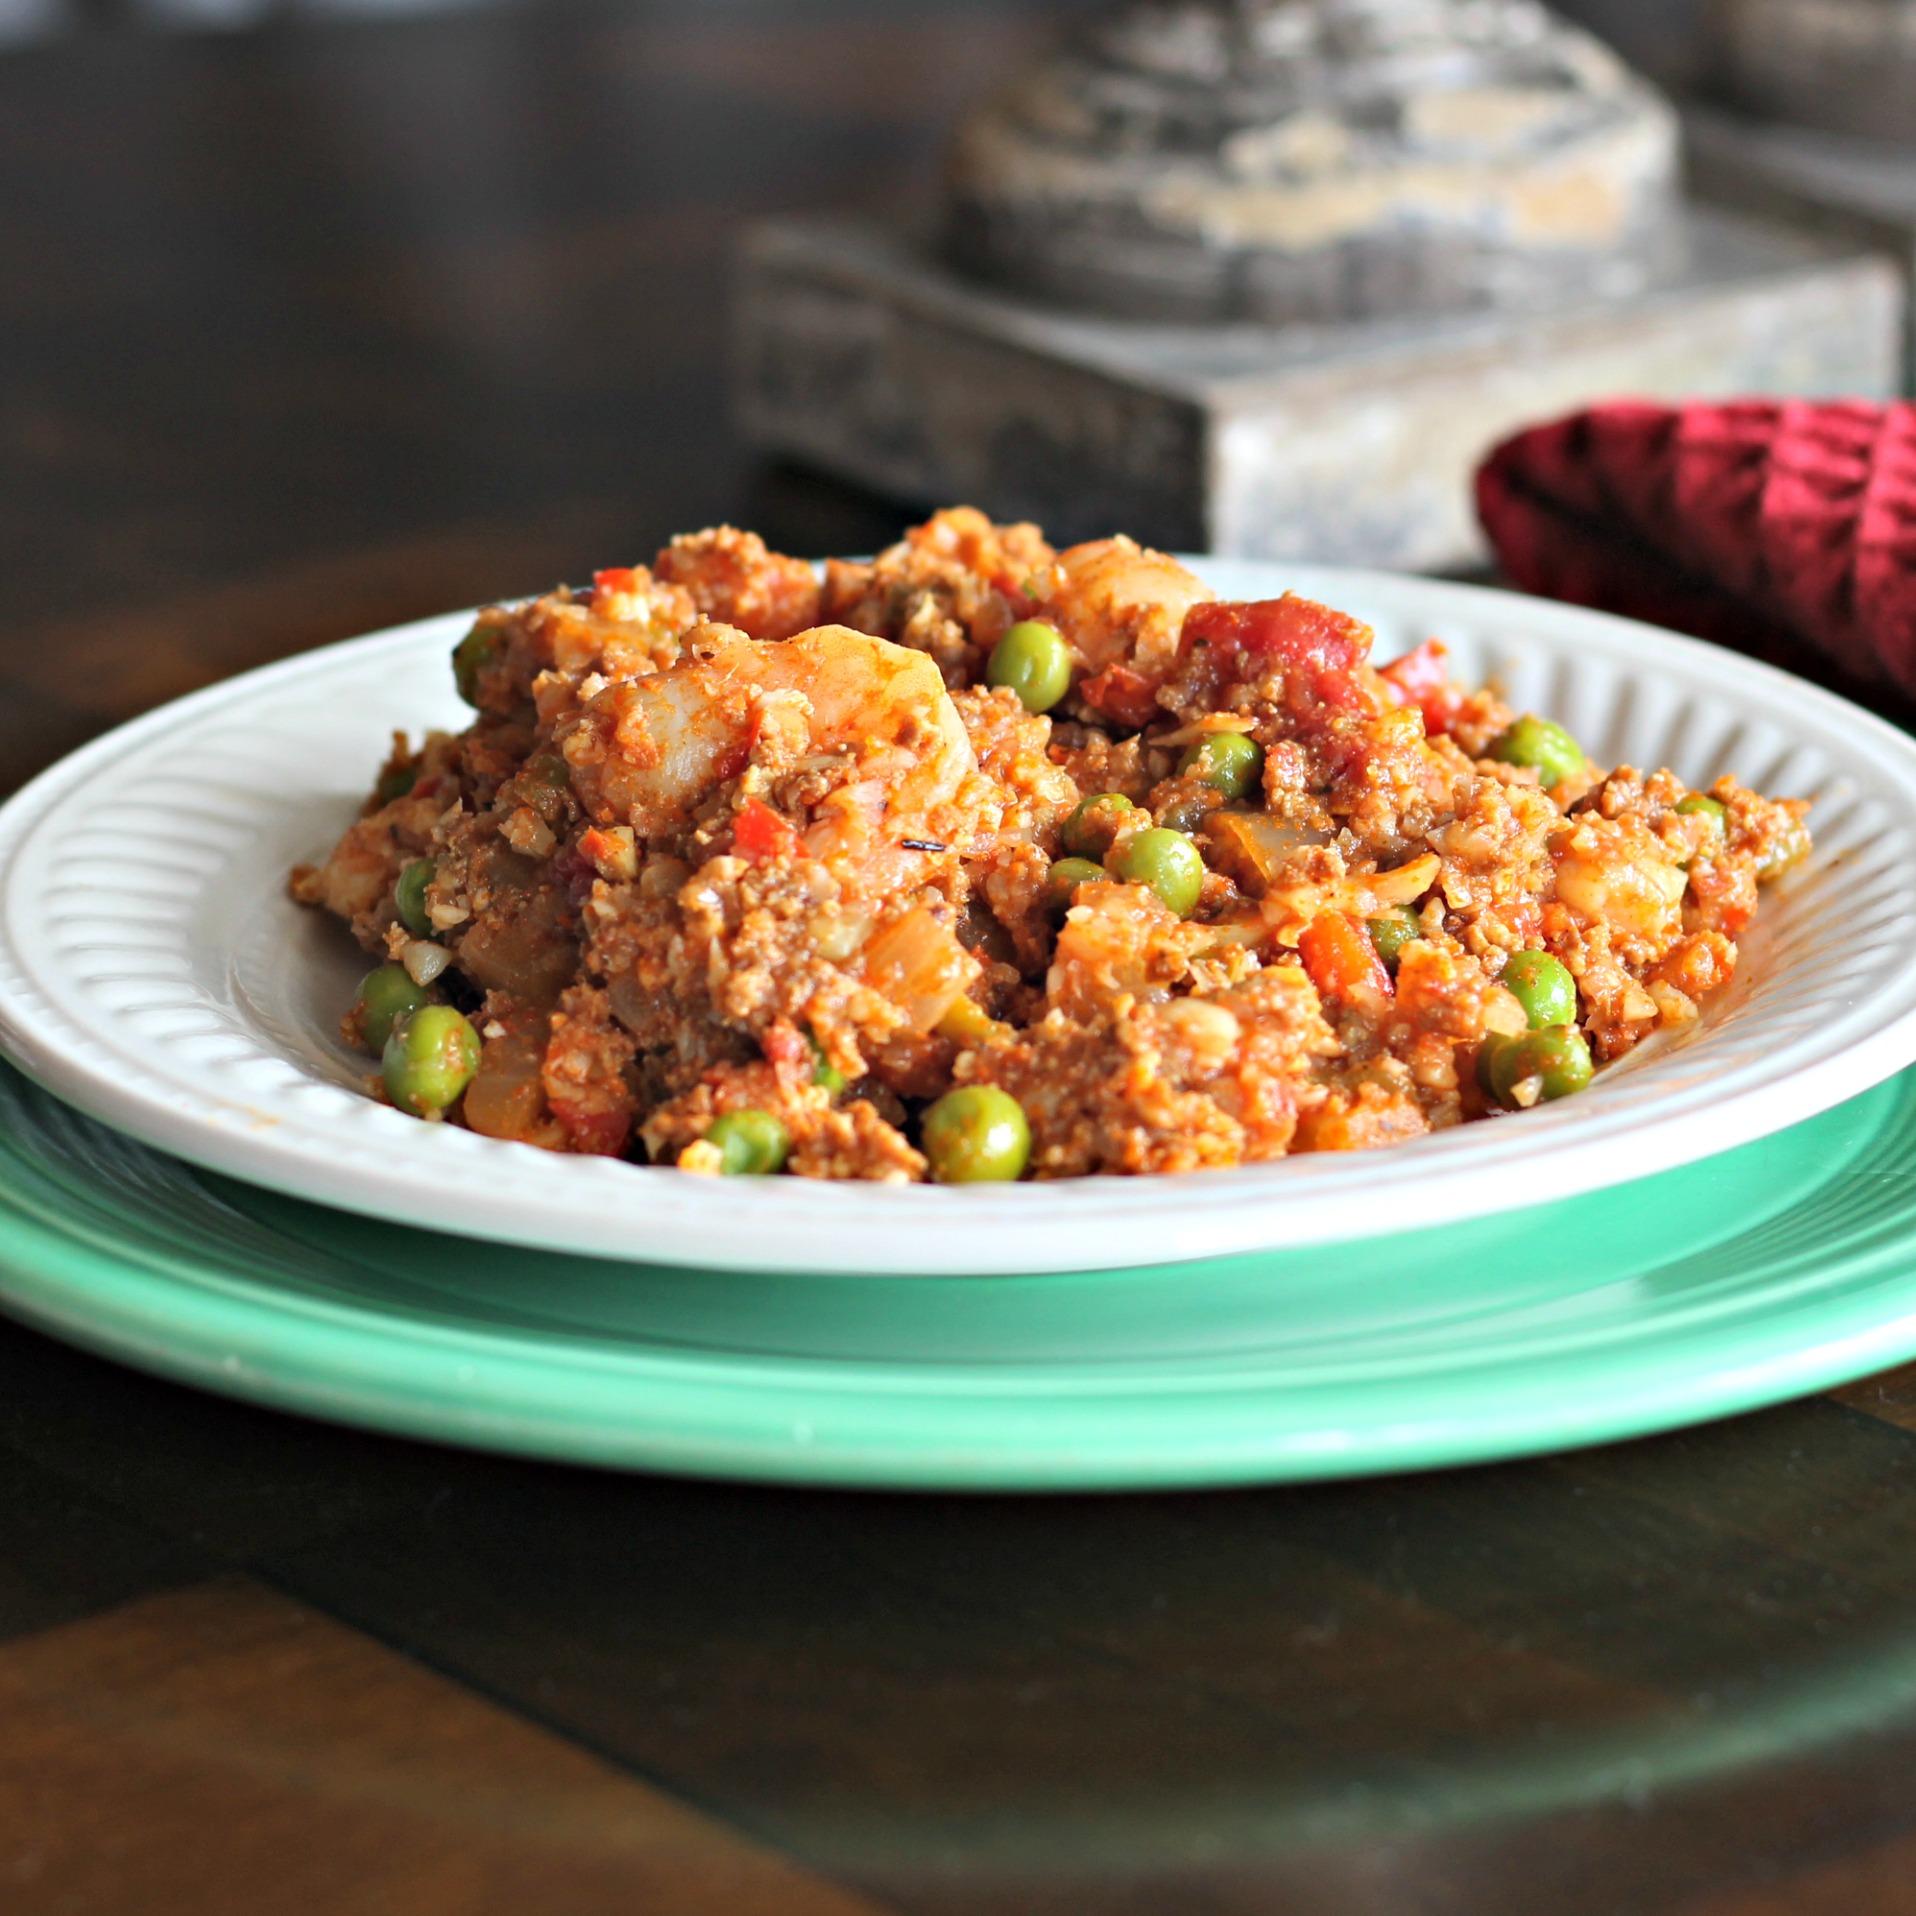 Mexican Paella with Cauliflower Rice duboo